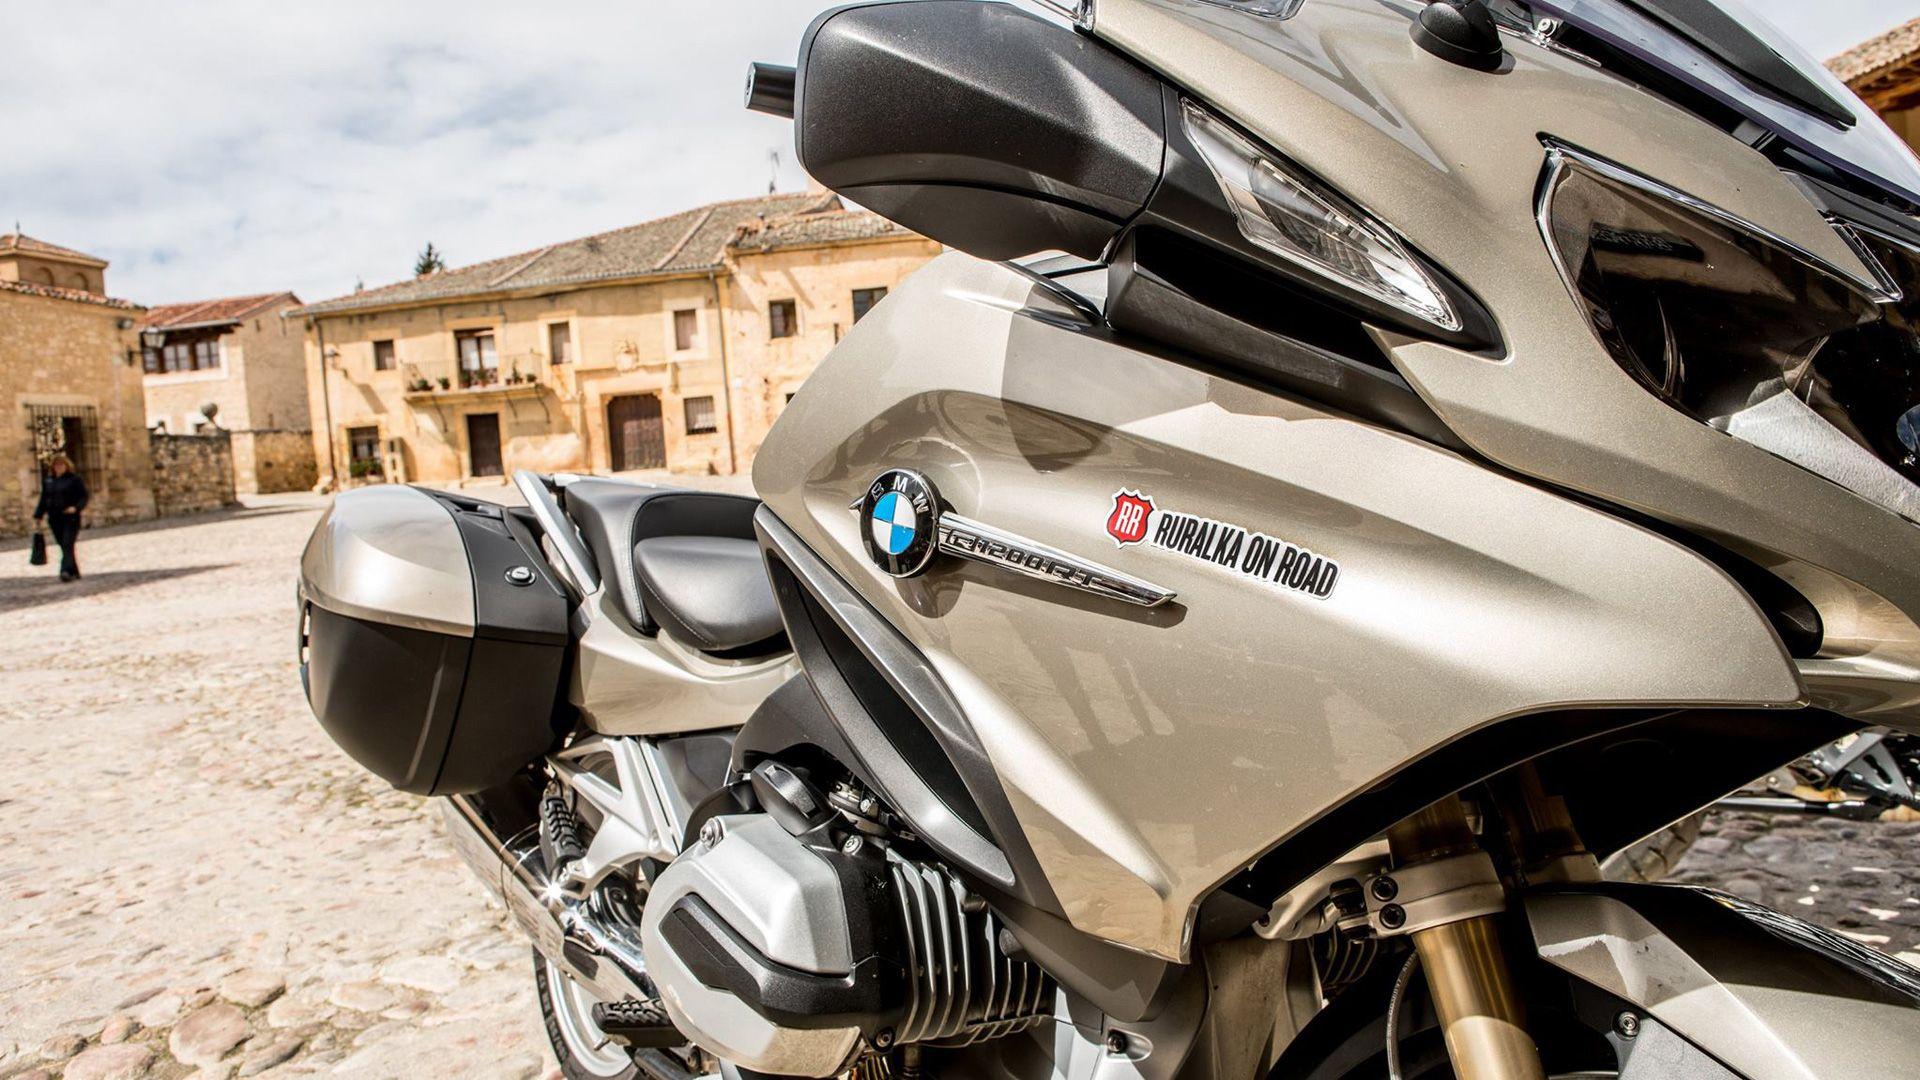 BMW-1200-RT